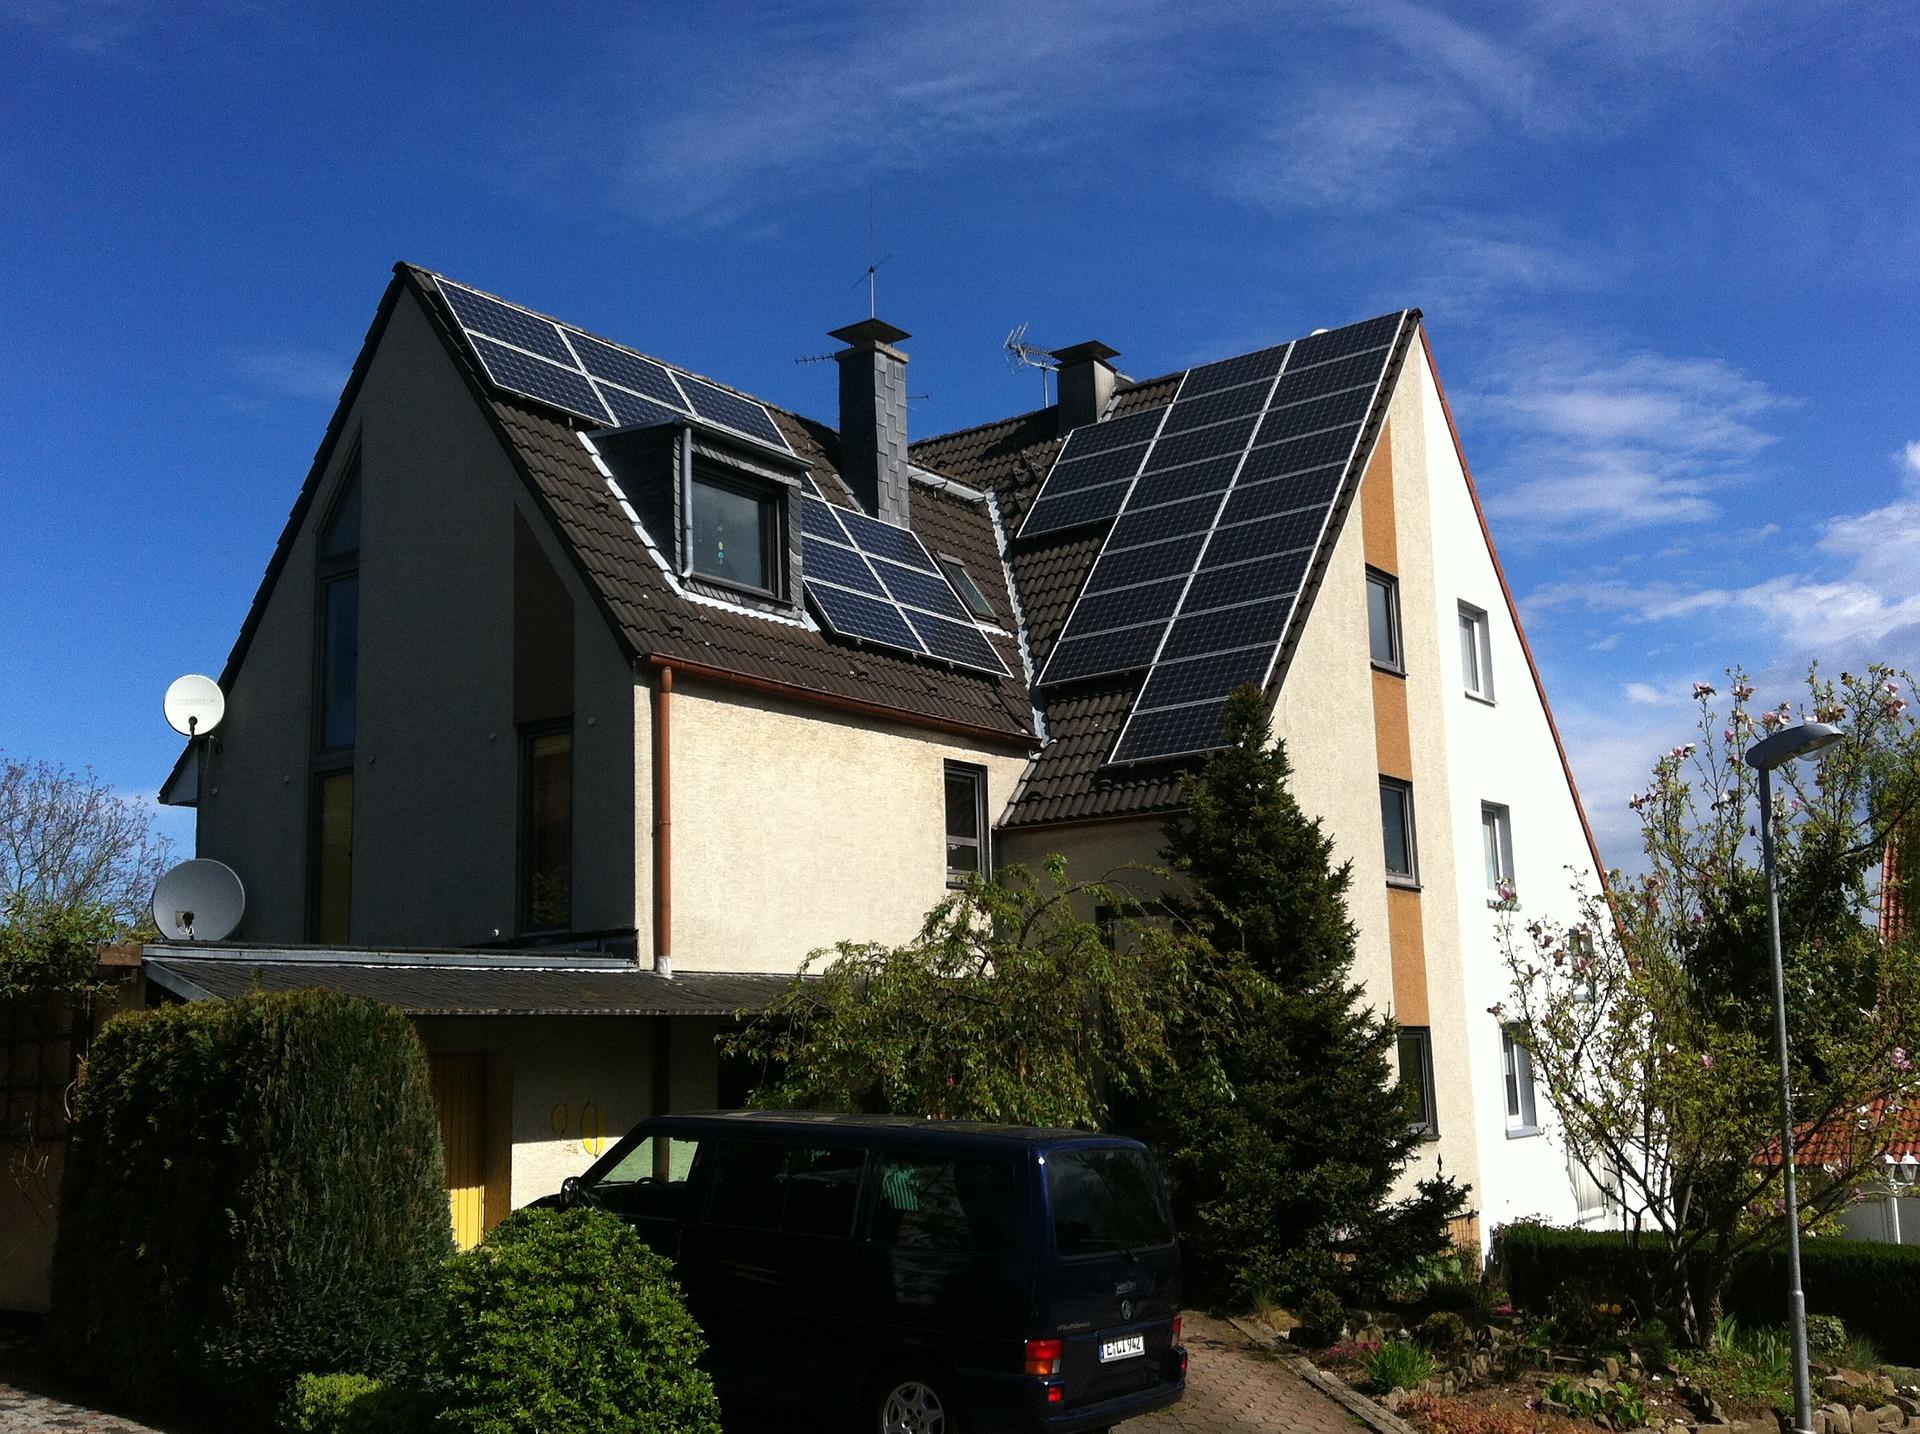 photovoltaic-1634595_1920.jpg